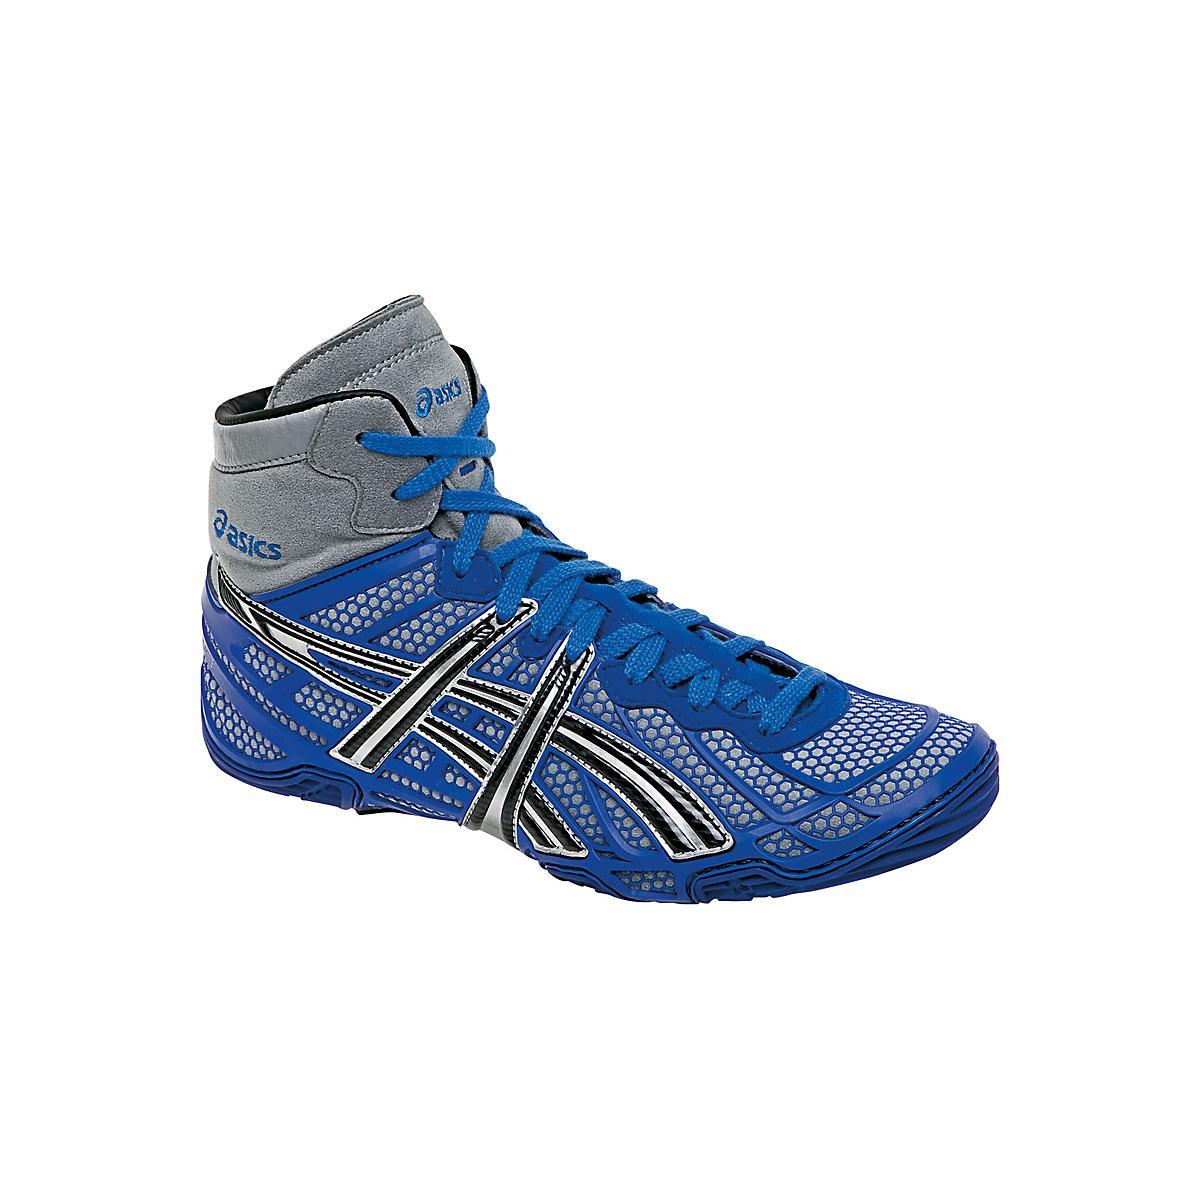 Chaussure de lutte Sports masculine ASICS masculine Dan Gable Ultimate 2 Dan chez Road Runner Sports d2b2e1e - afilia.info